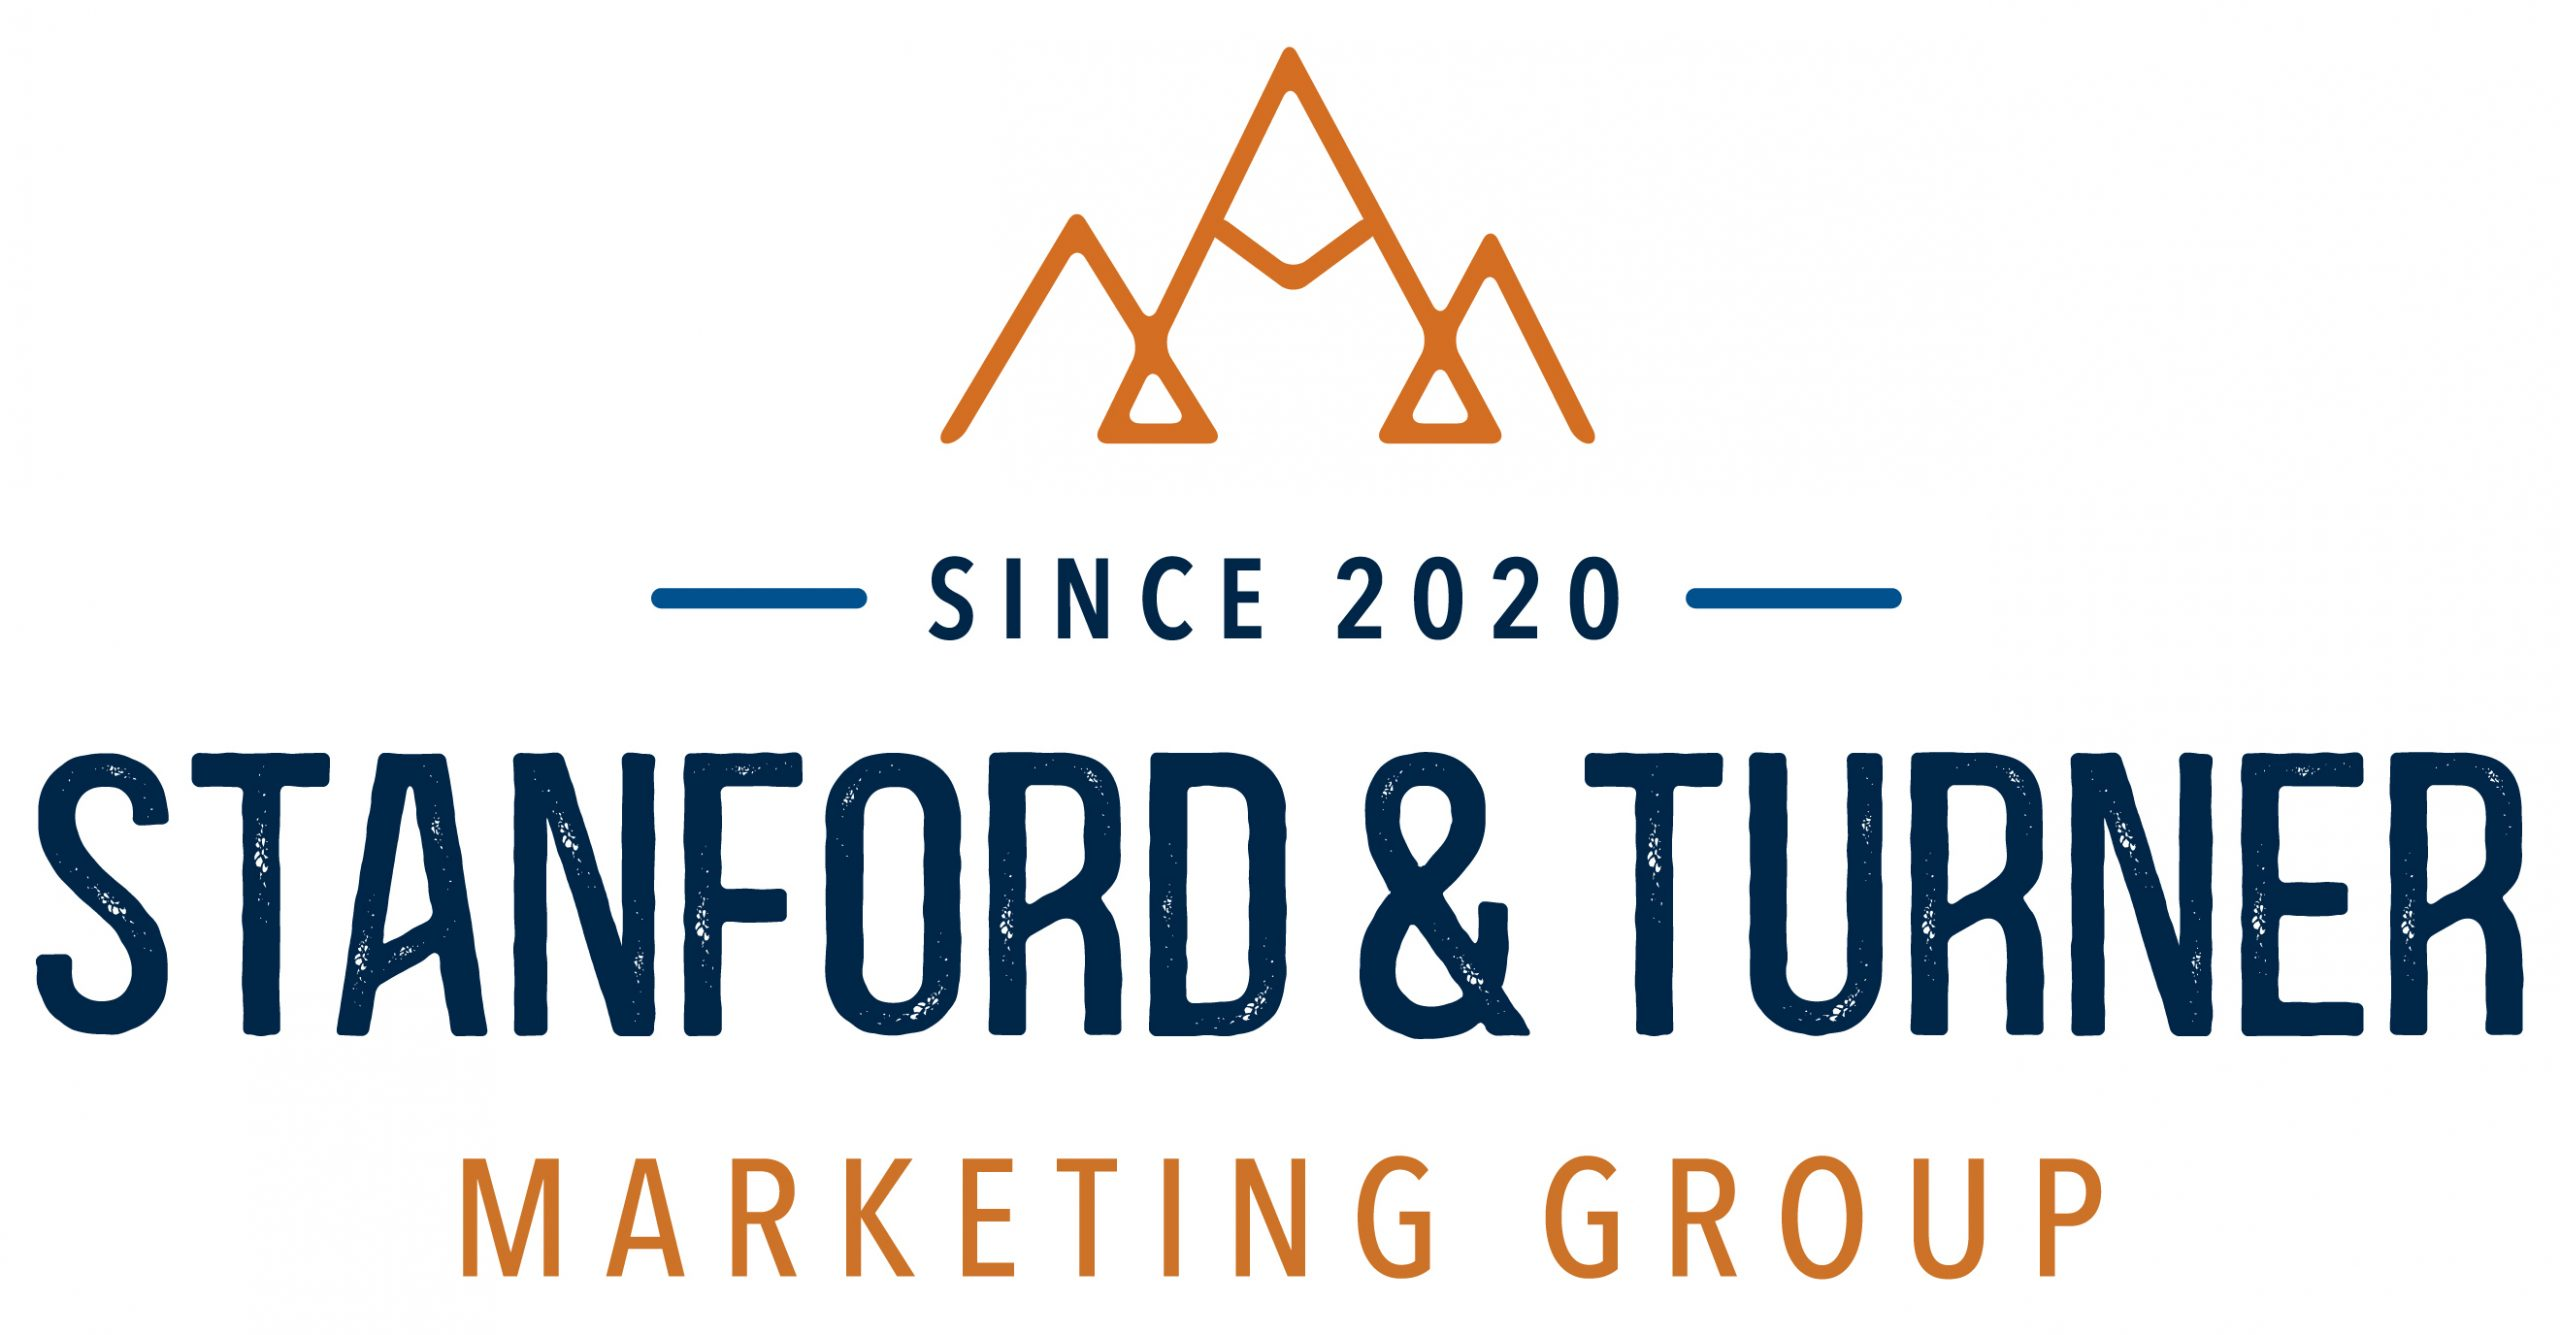 Stanford & Turner Marketing Group